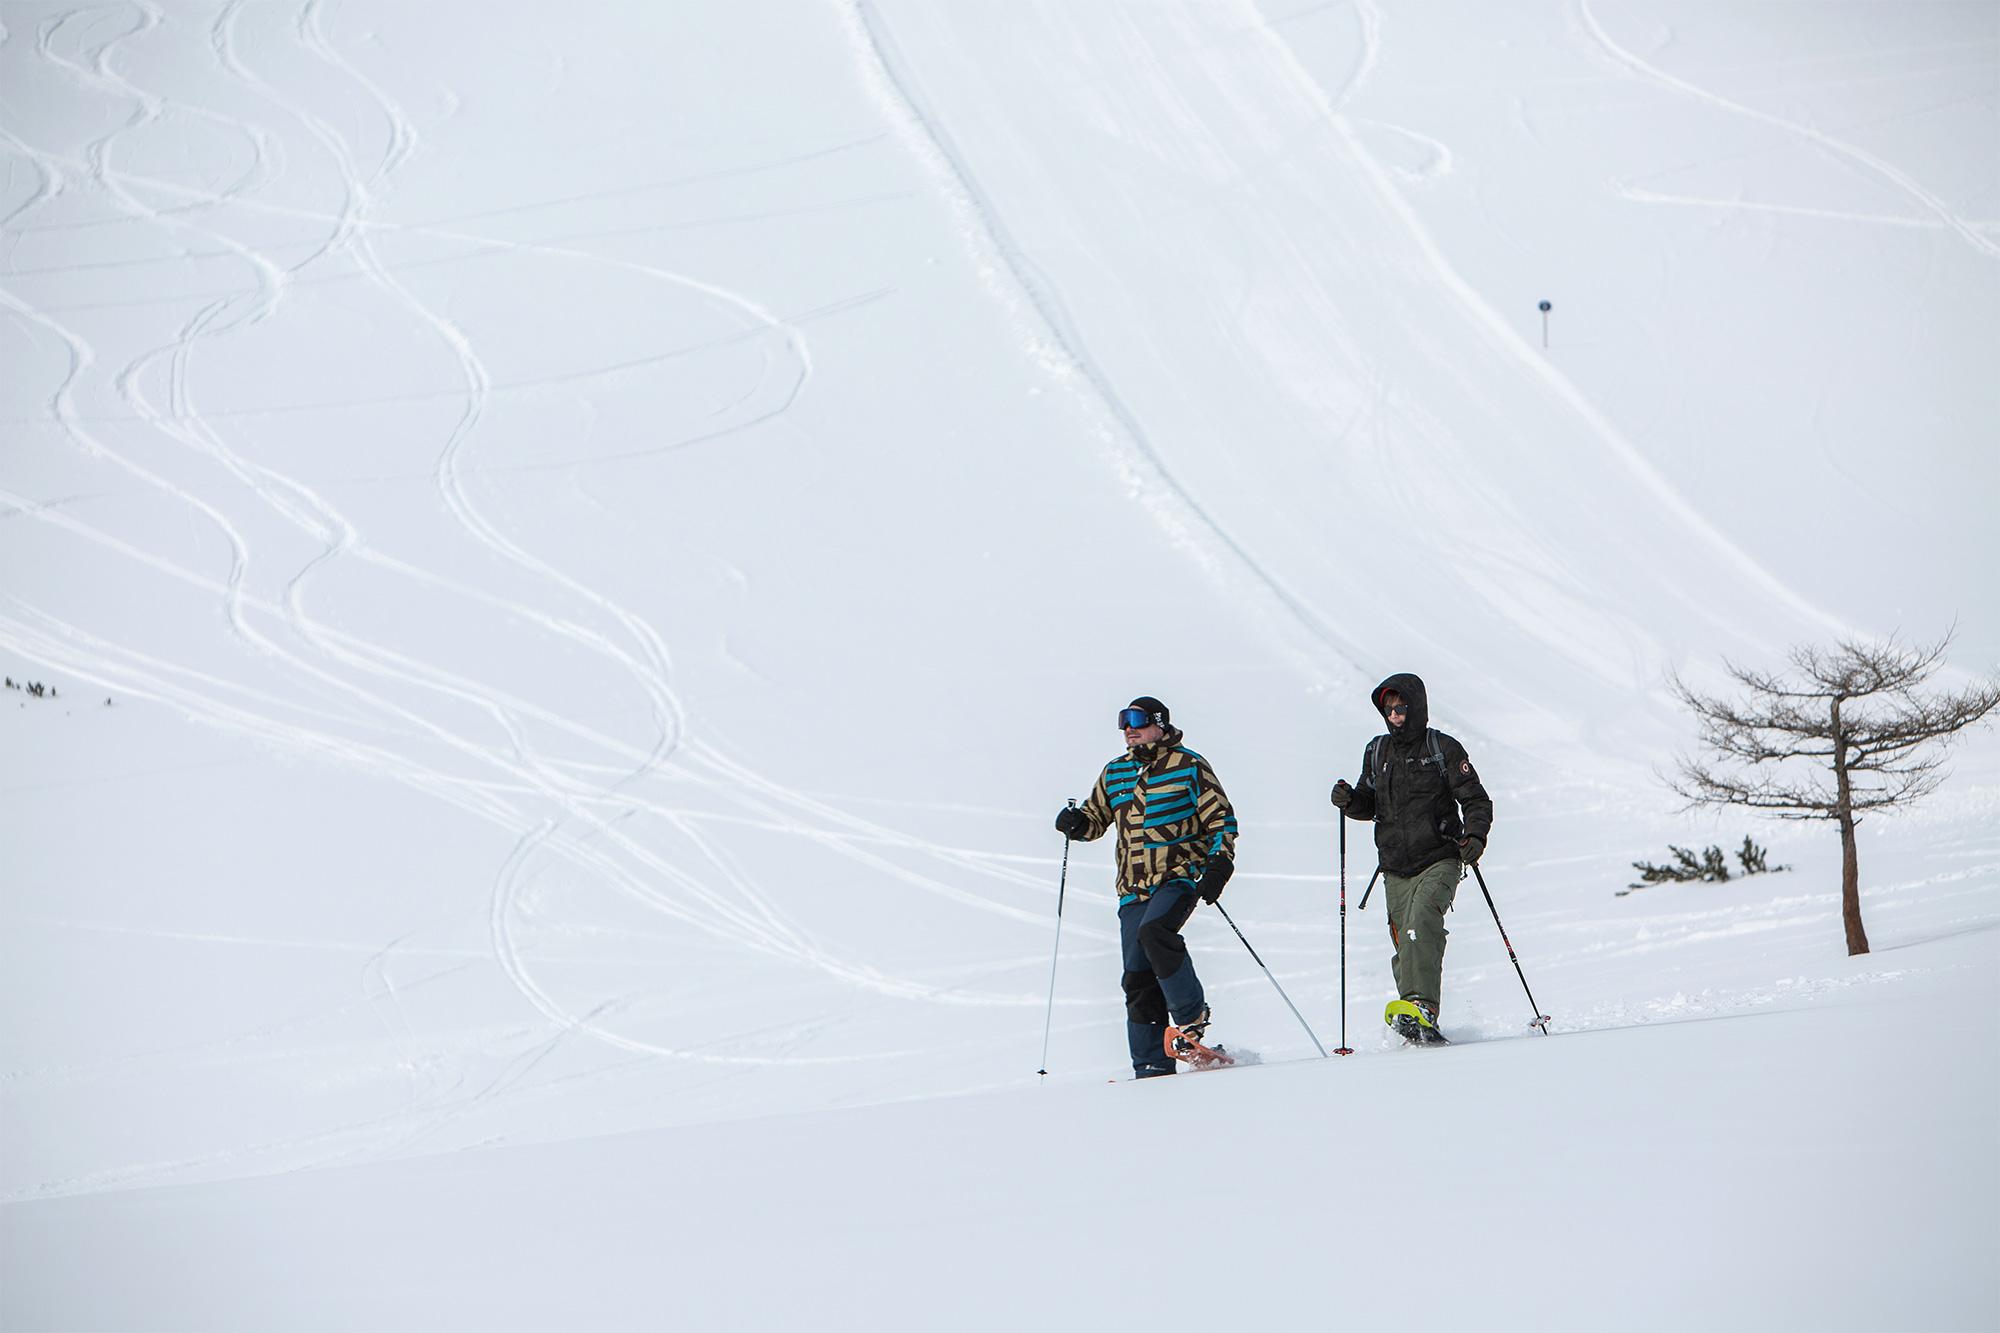 Bürgeralm Schneeschuhrunde